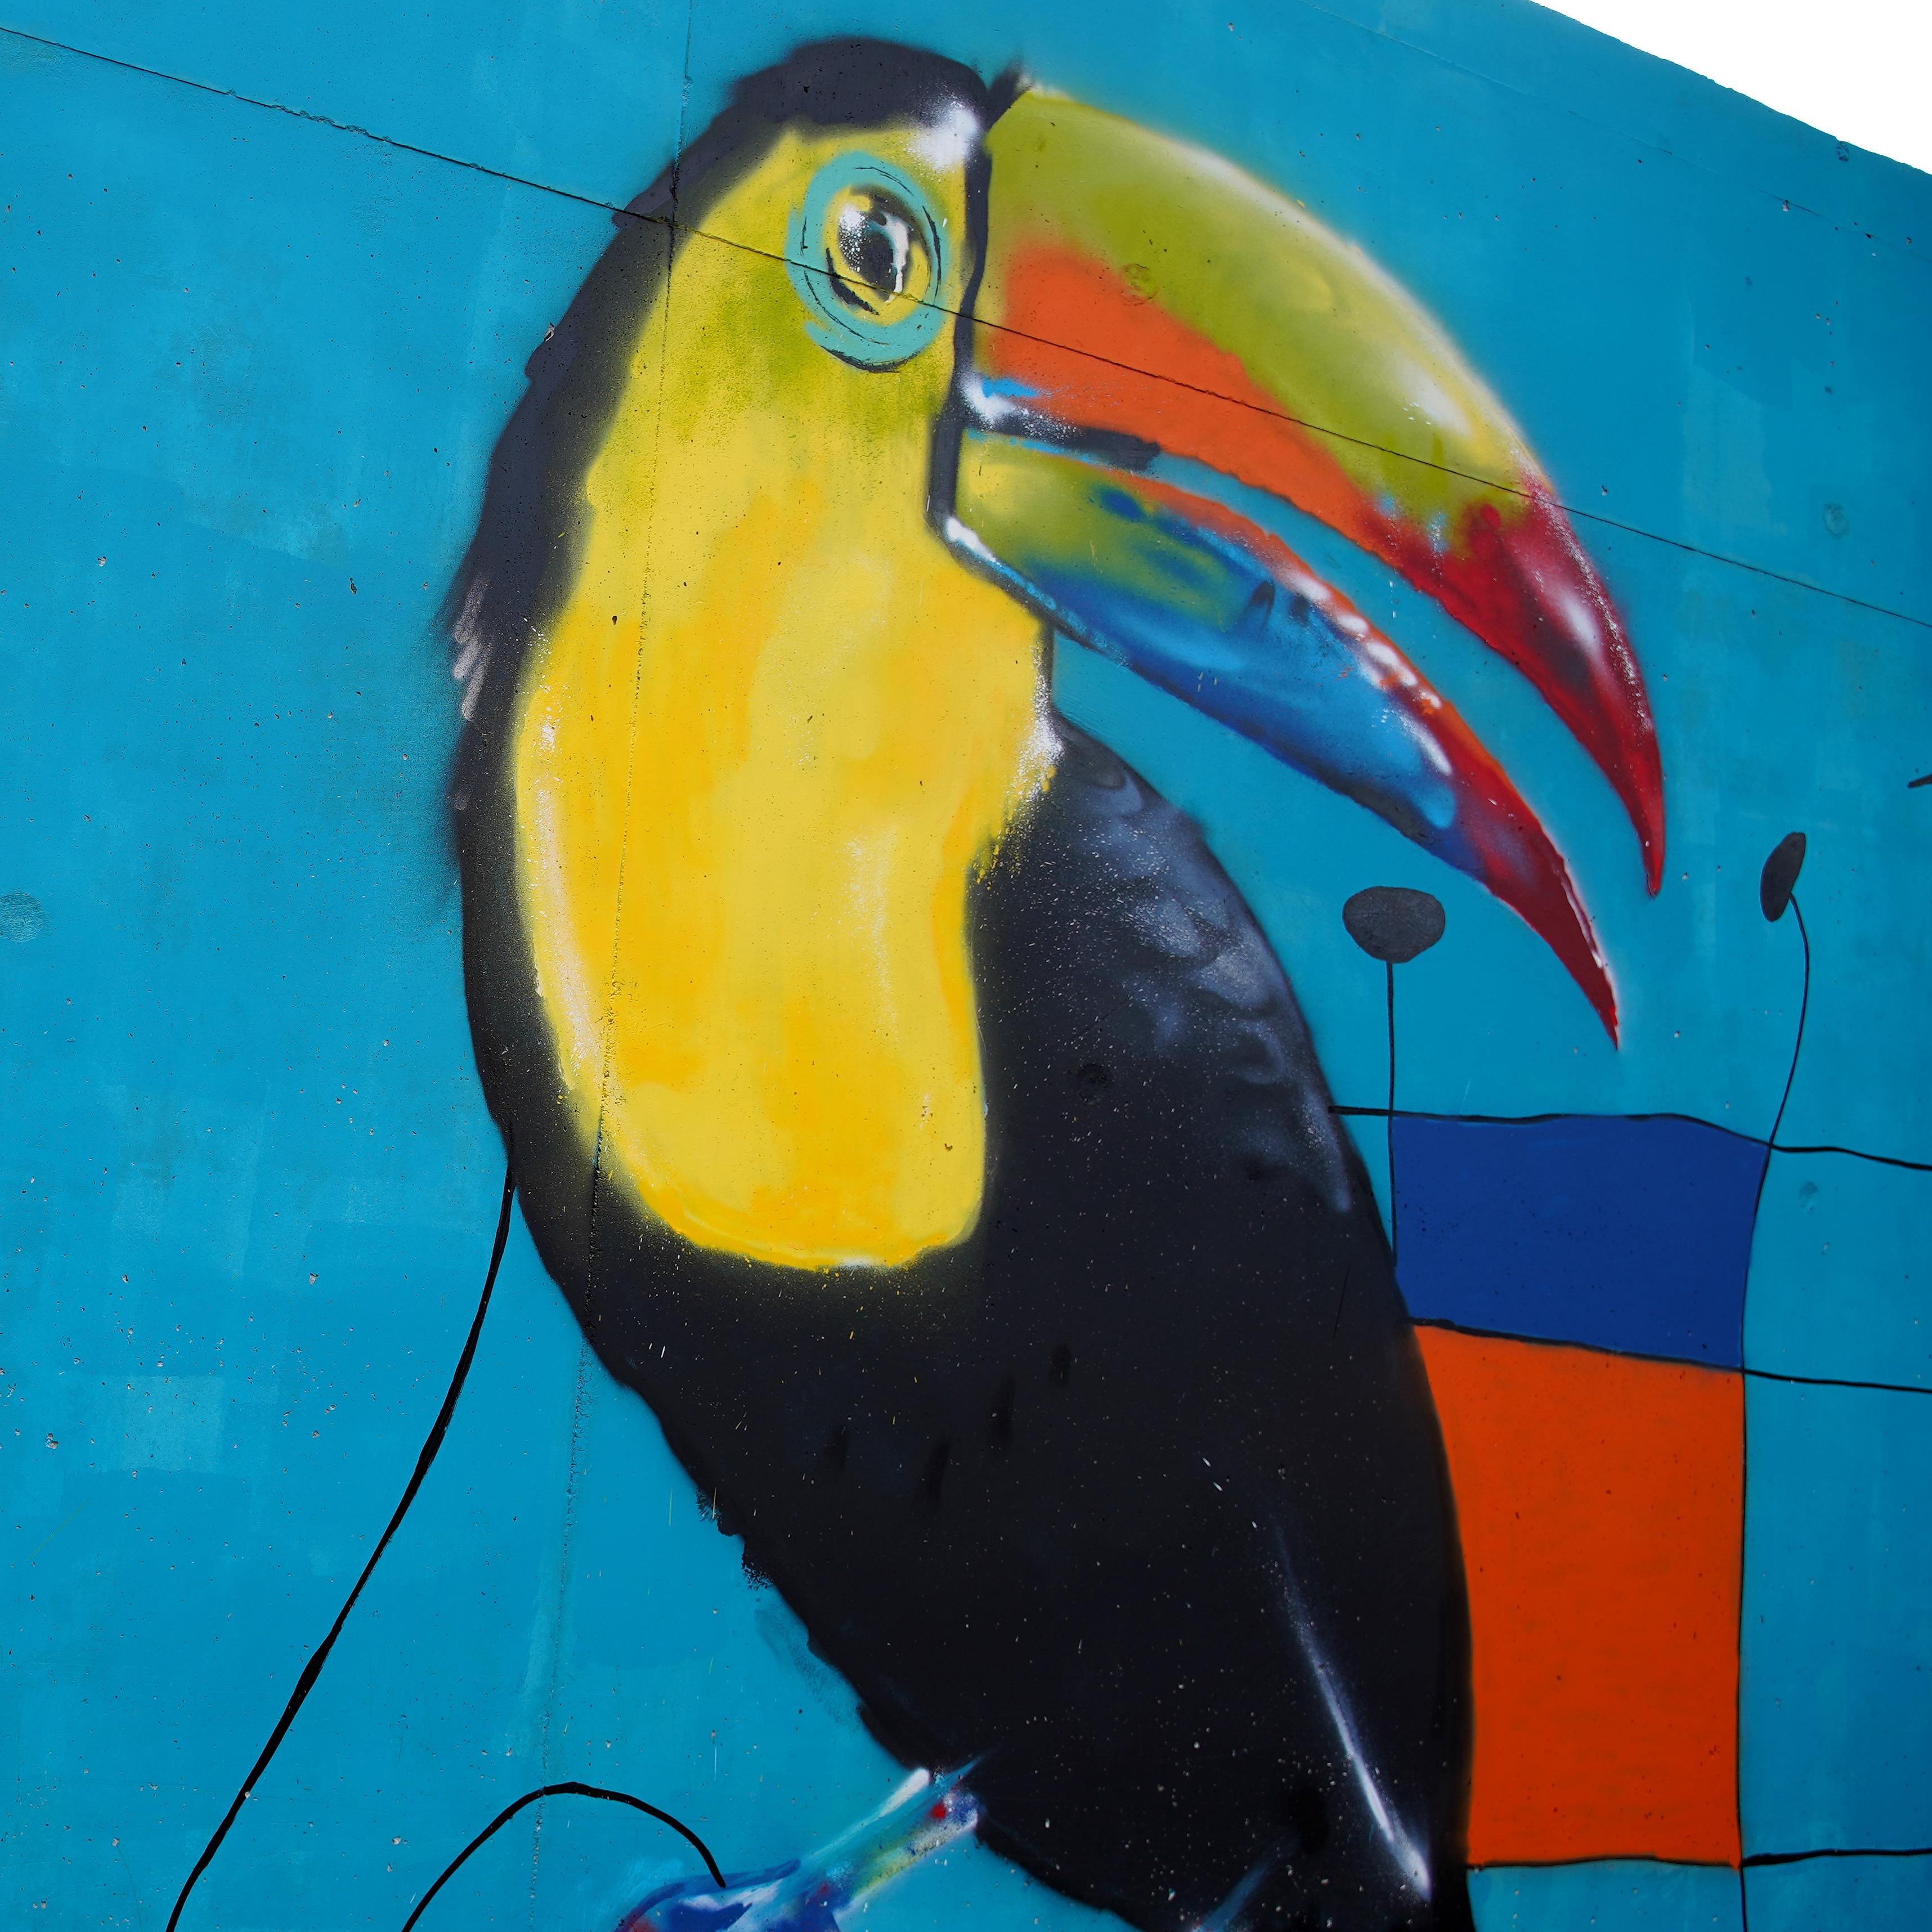 Peinture profacile, eban mural, peinture exterieur